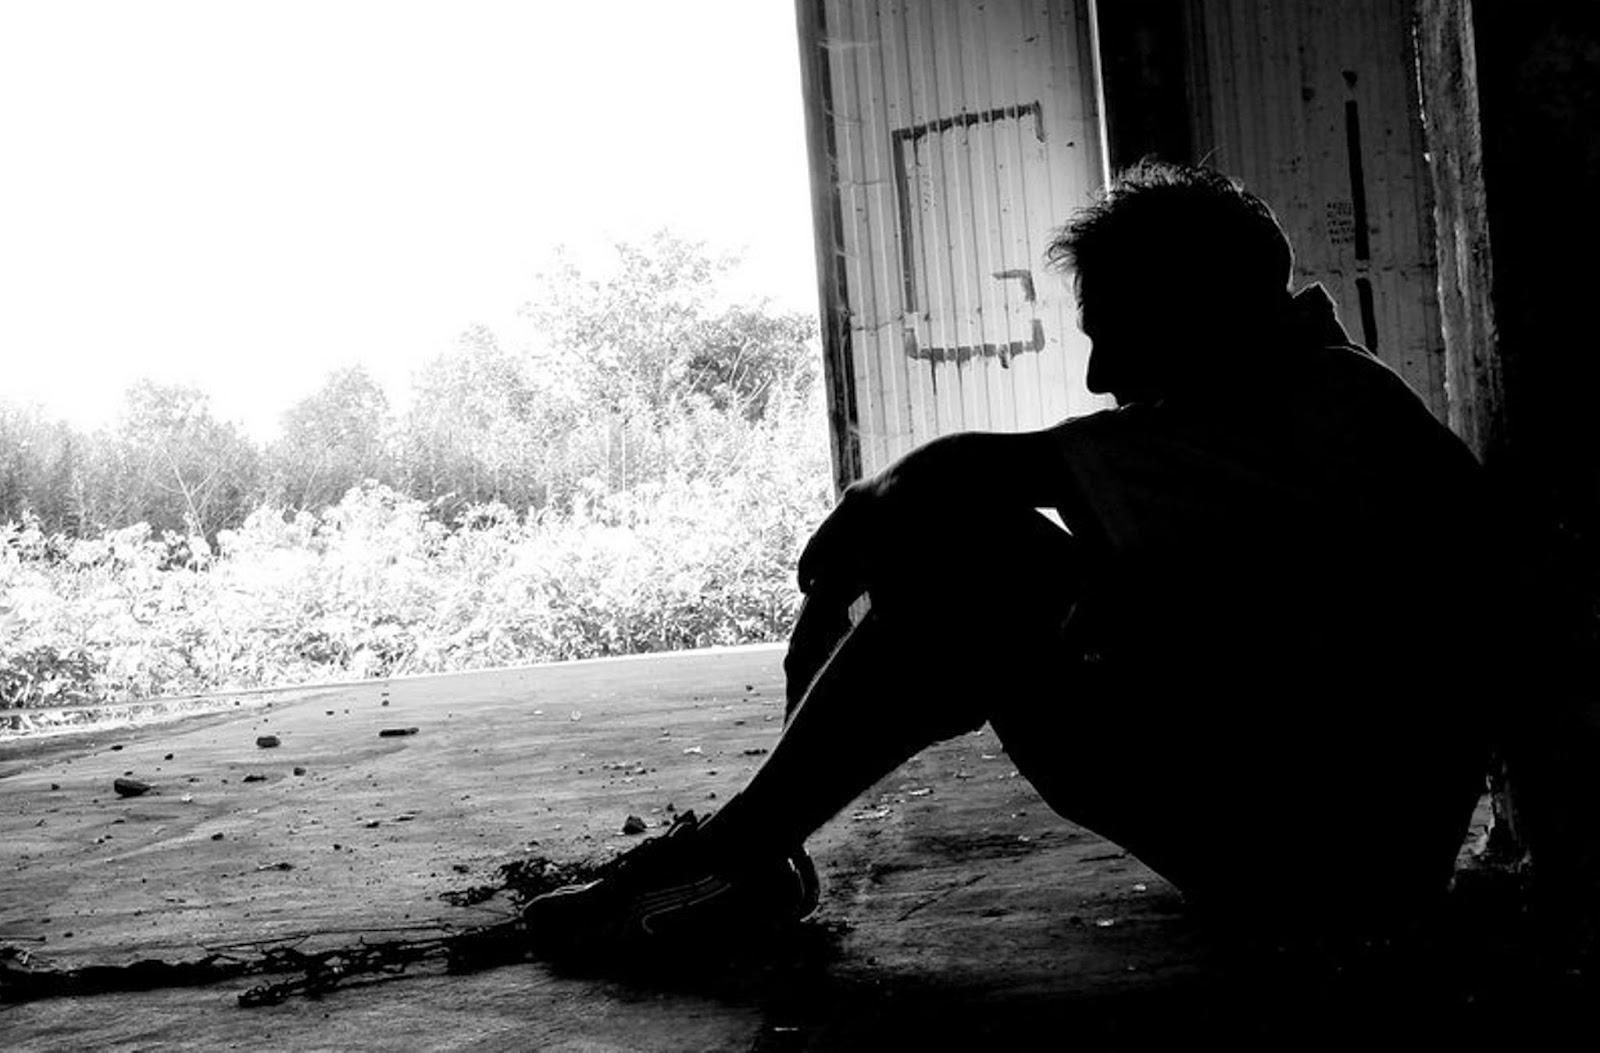 Top 40 Photos of Sad Boy Images Wallpaper - The Best ... Sad